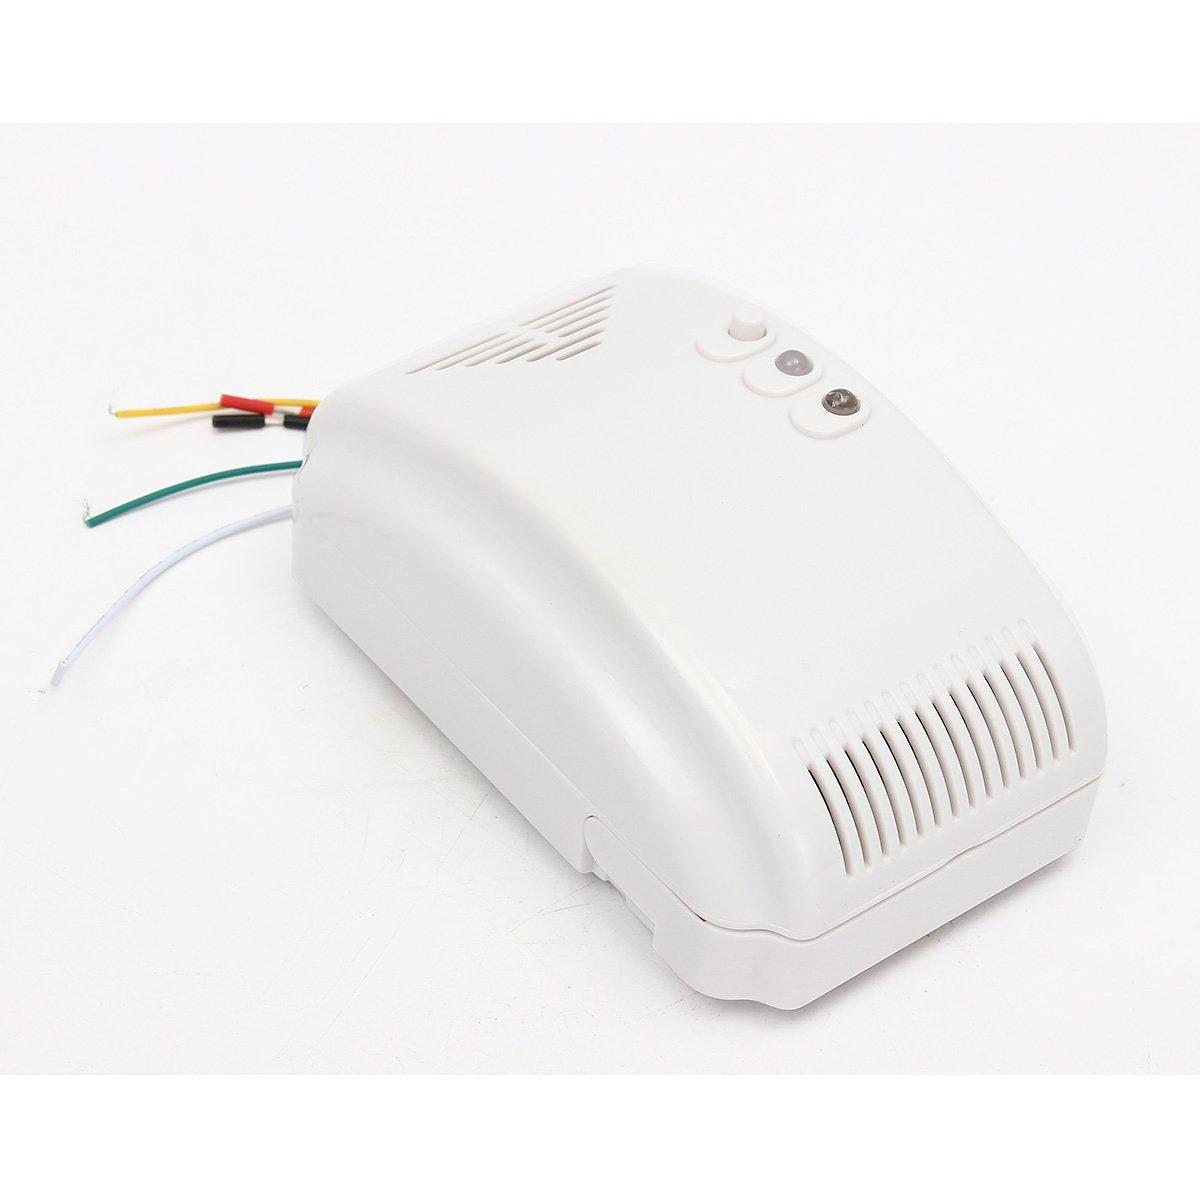 12V Gas Detector Sensor Alarm Propane Butane LPG Natural Motorhome Camper Marine - - Amazon.com